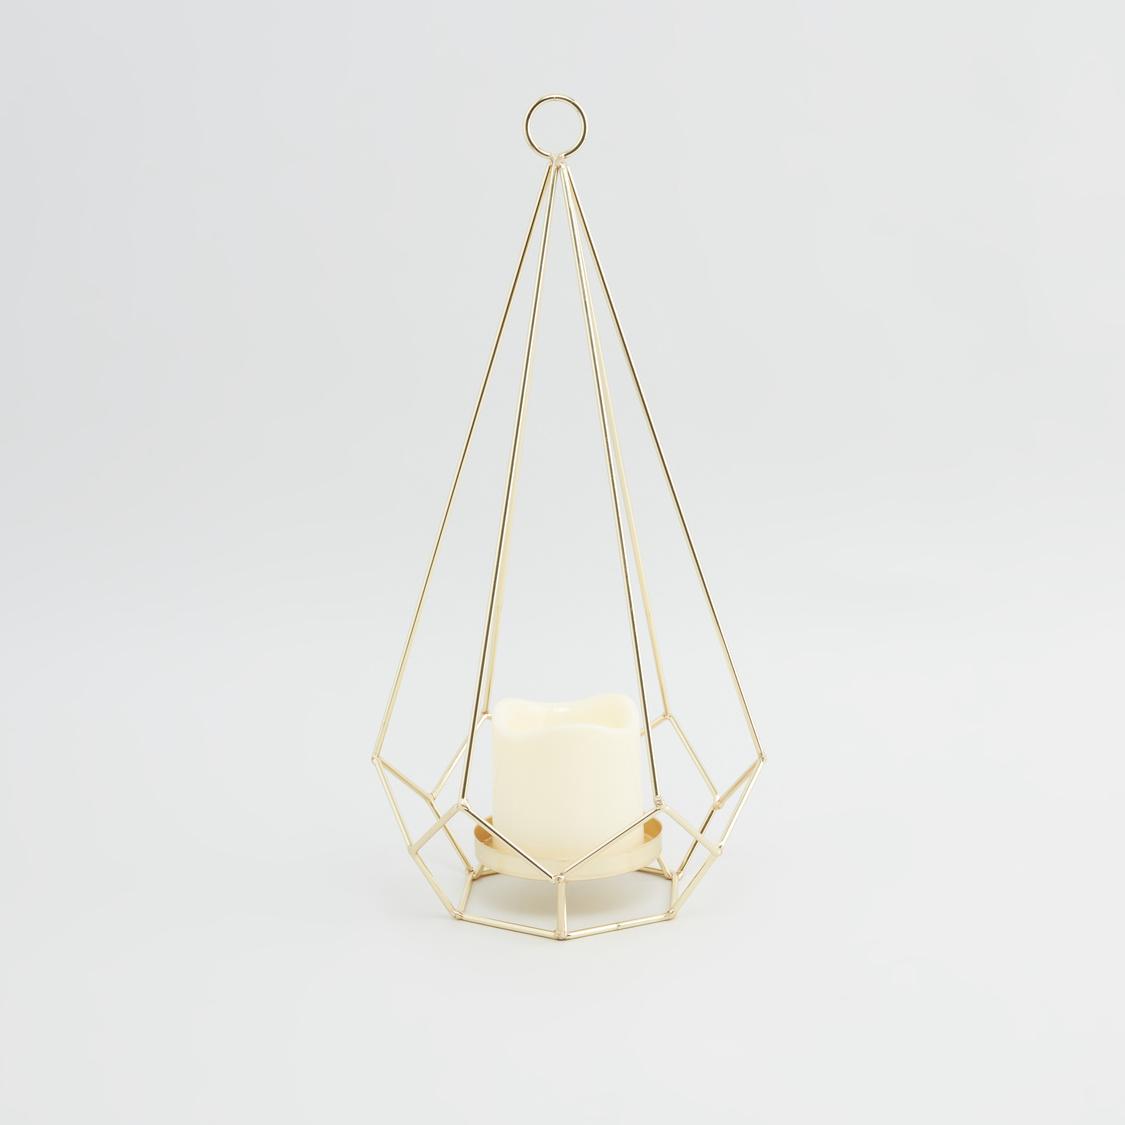 Decorative Candle Holder - 20x17x38 cms